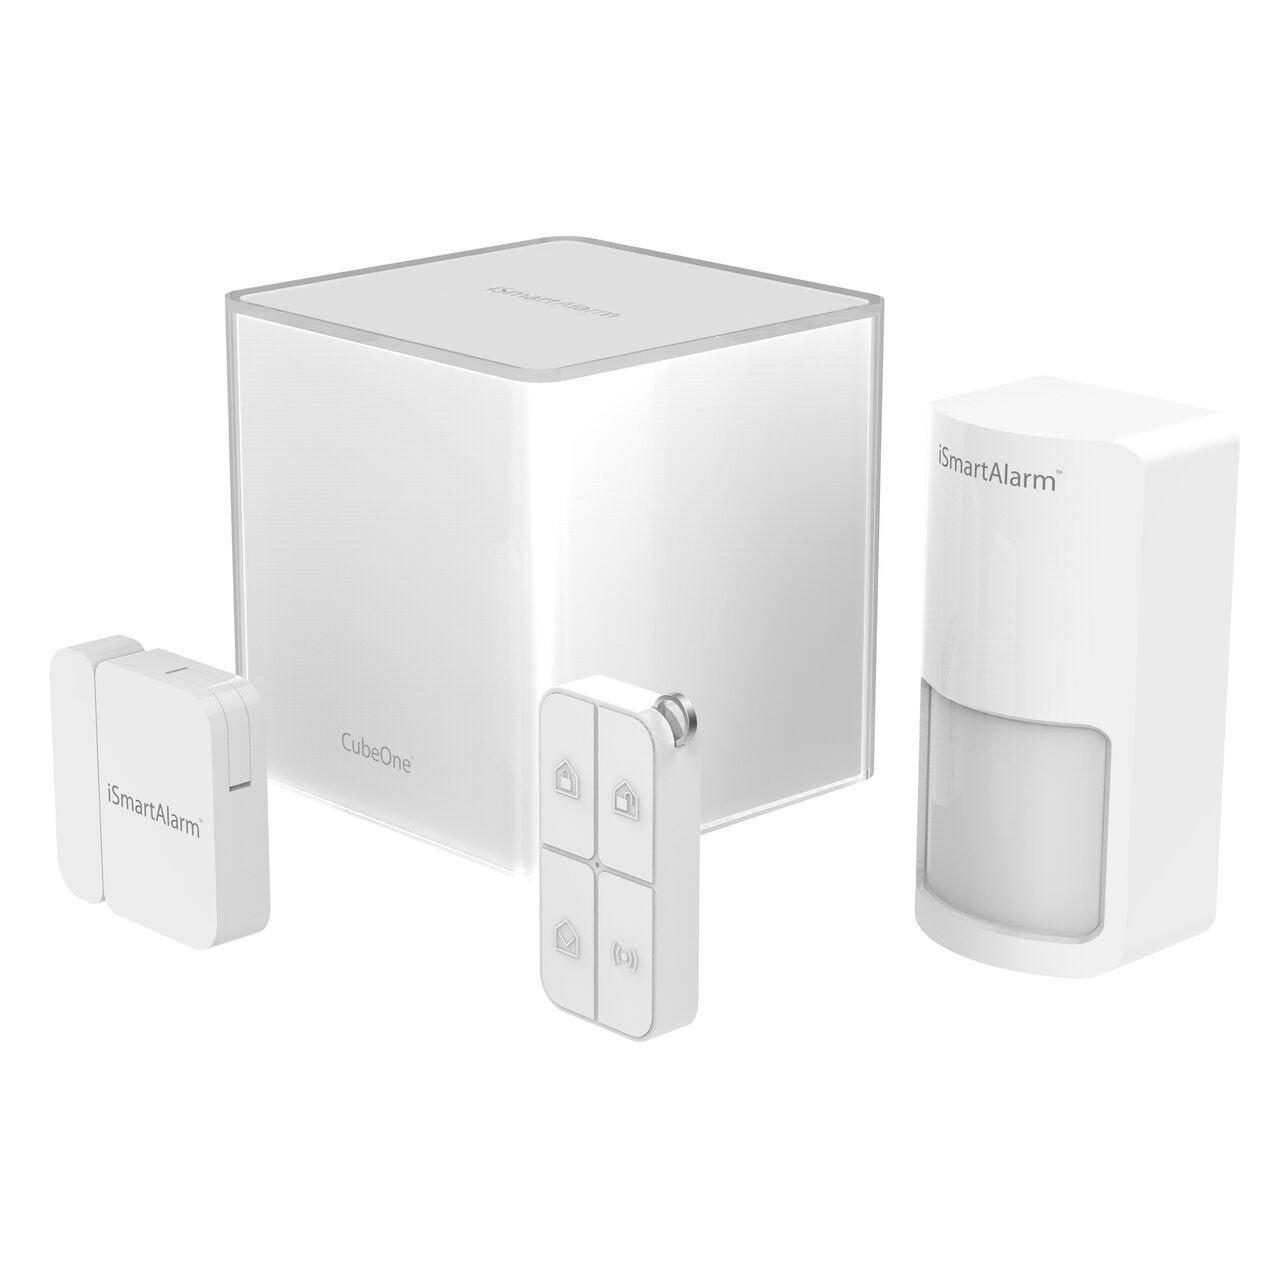 alarme maison sans fil connectee. Black Bedroom Furniture Sets. Home Design Ideas